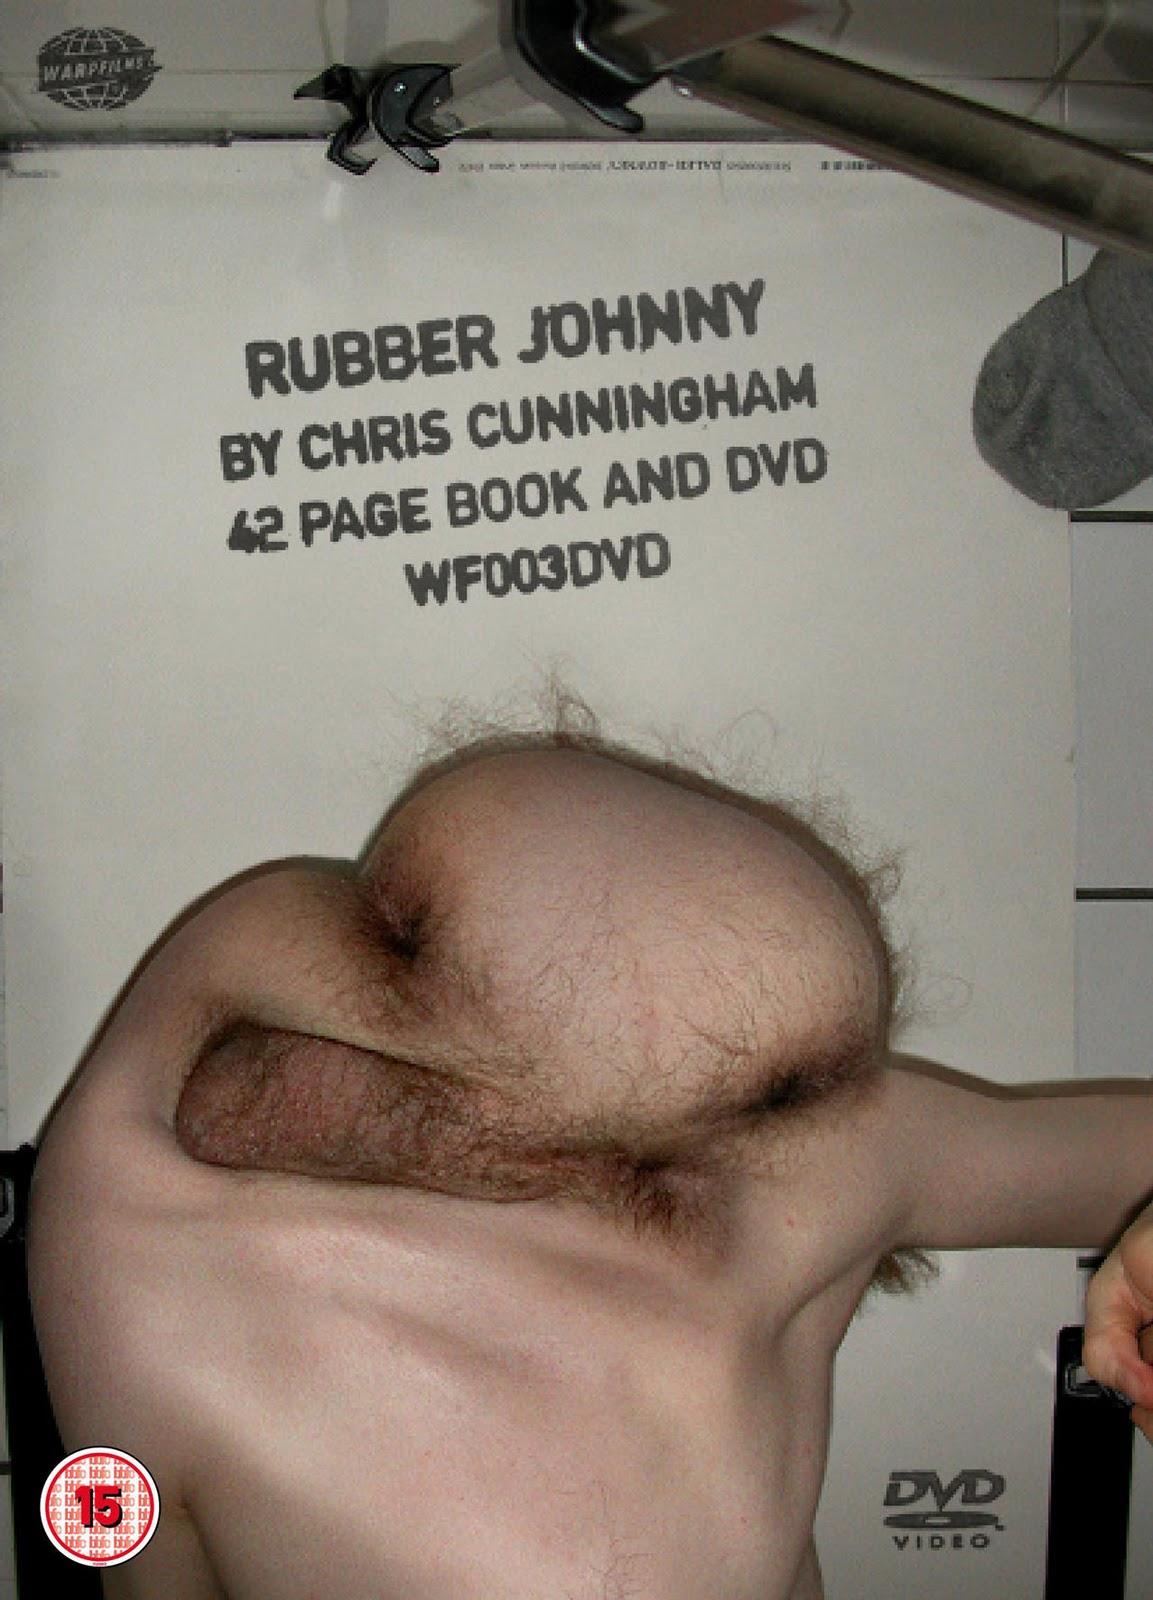 http://2.bp.blogspot.com/-UFVuwwHXXHs/TysEfWiu7uI/AAAAAAAABeE/Iu35K7mlgck/s1600/Rubber-Johnny-Packshot-1.jpg